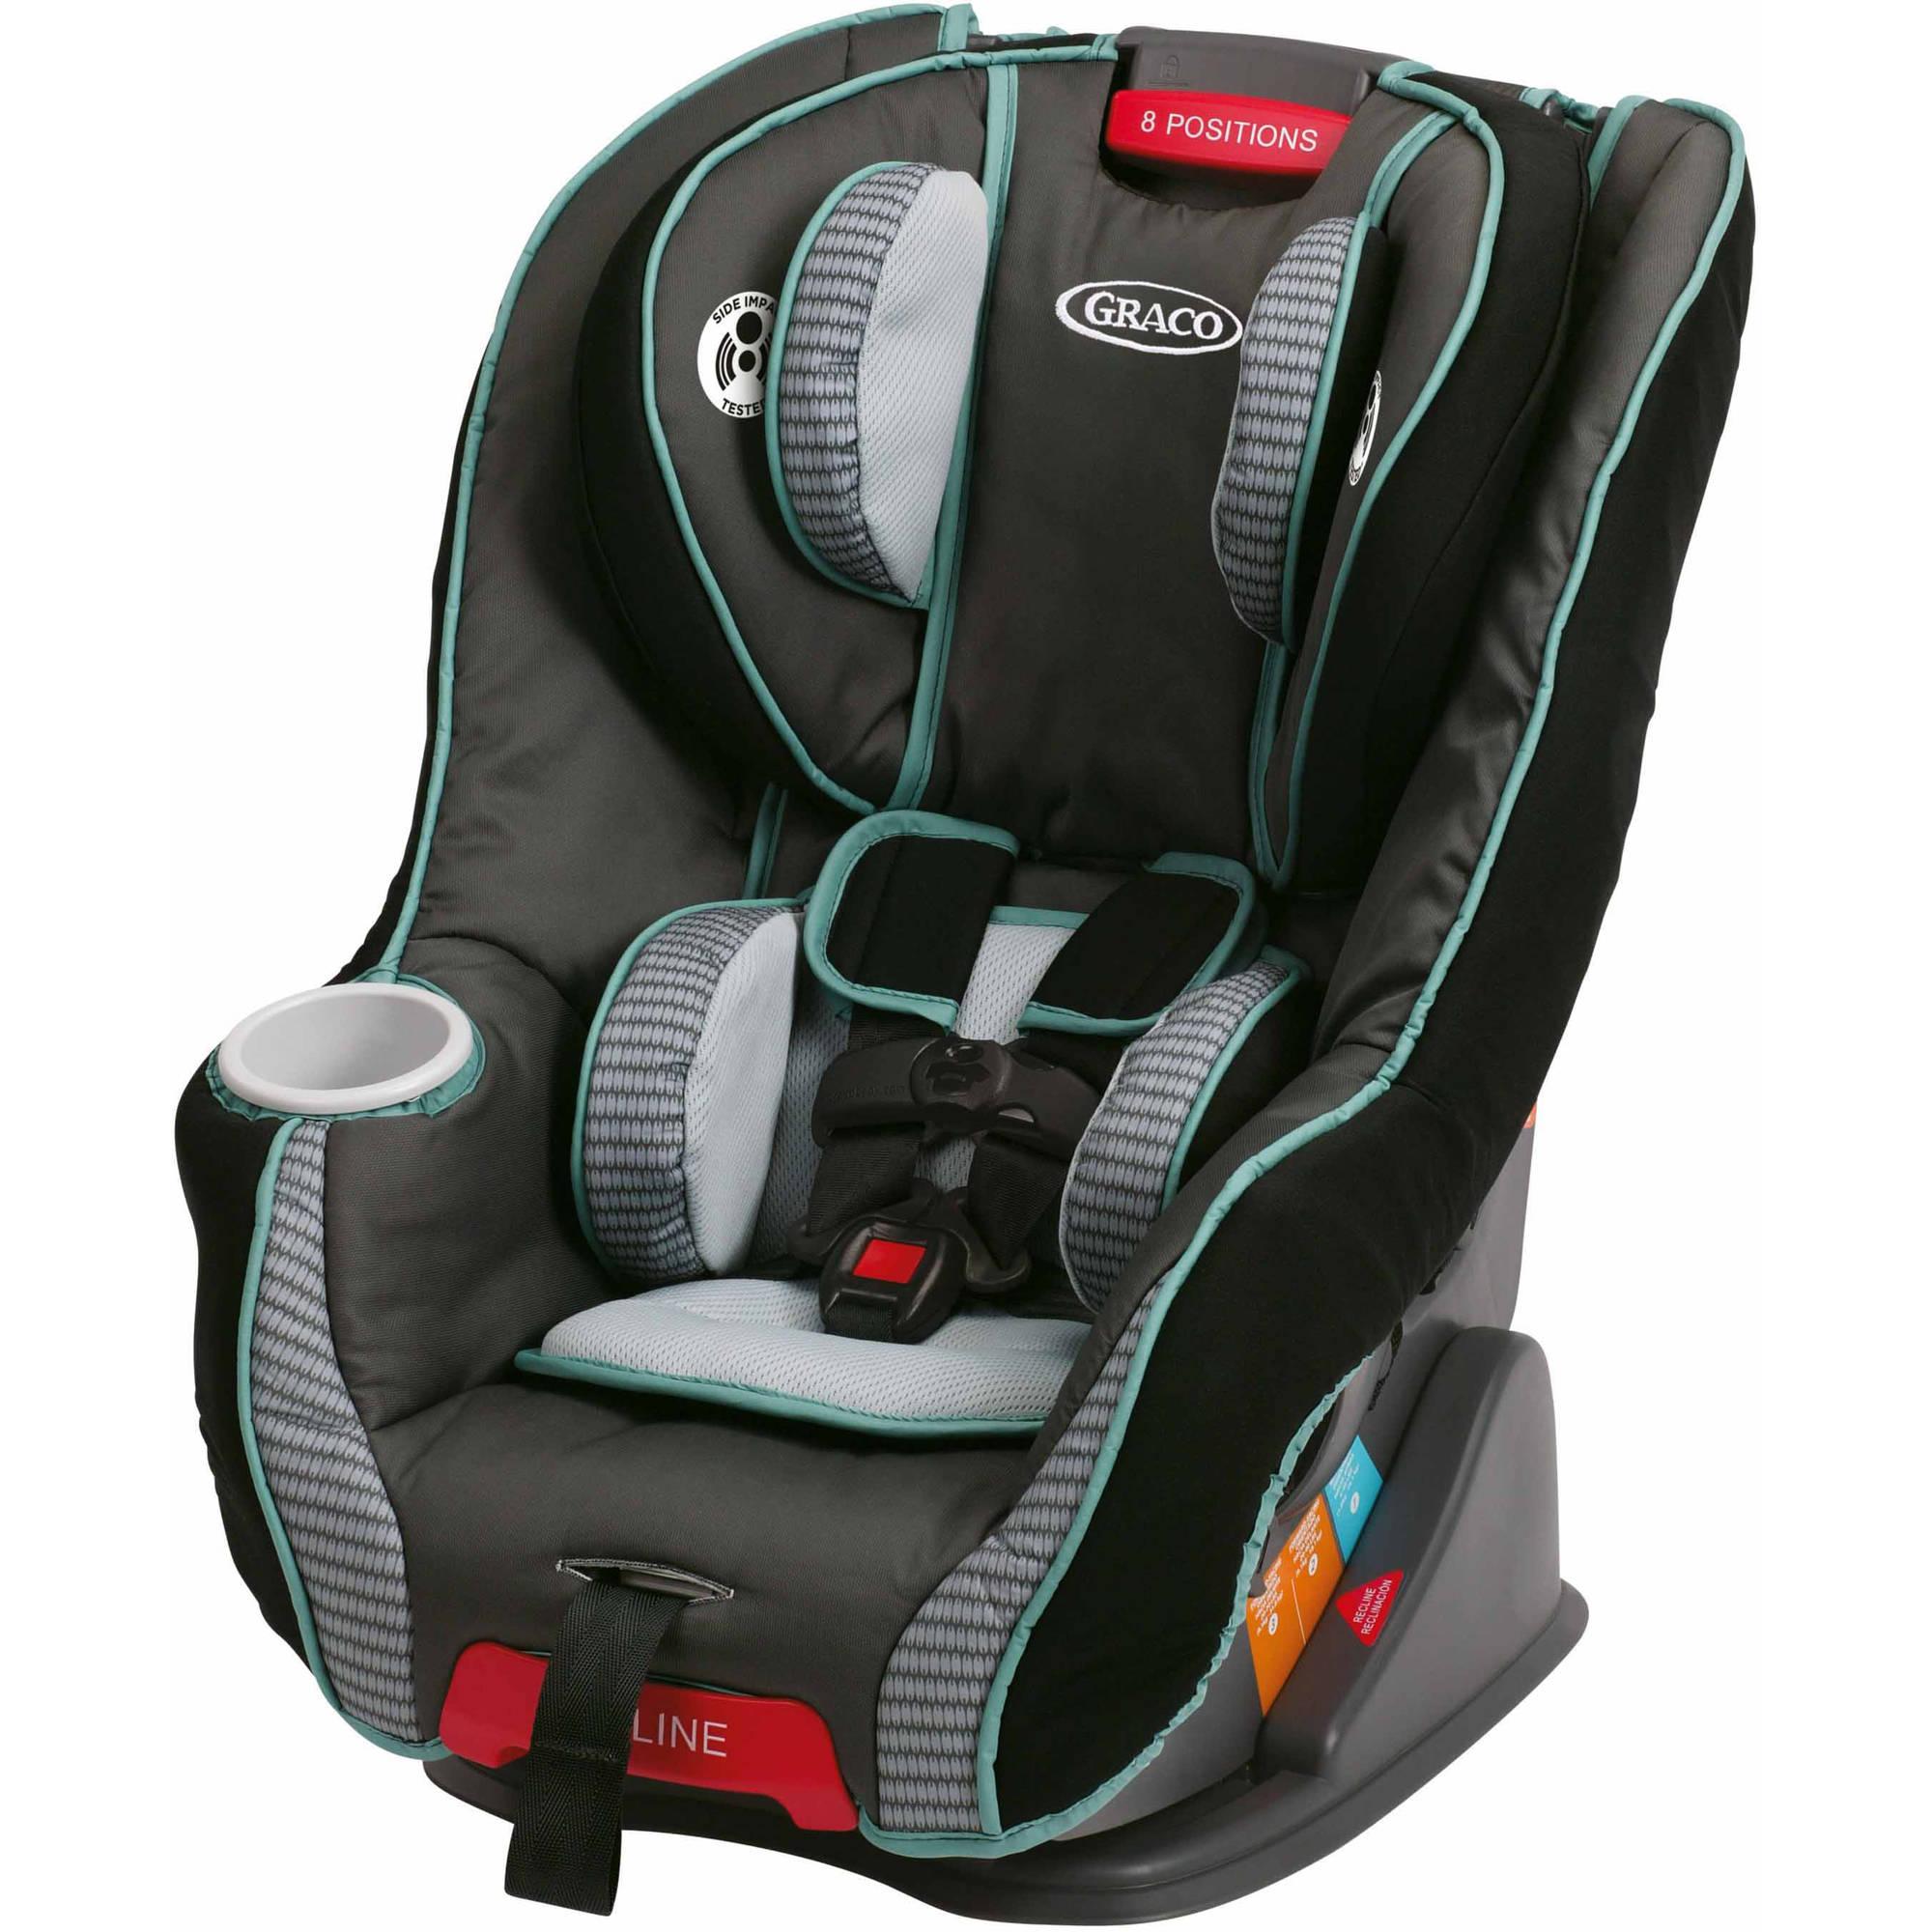 Graco Fit4Me 65 Convertible Baby Car Seat, Flip